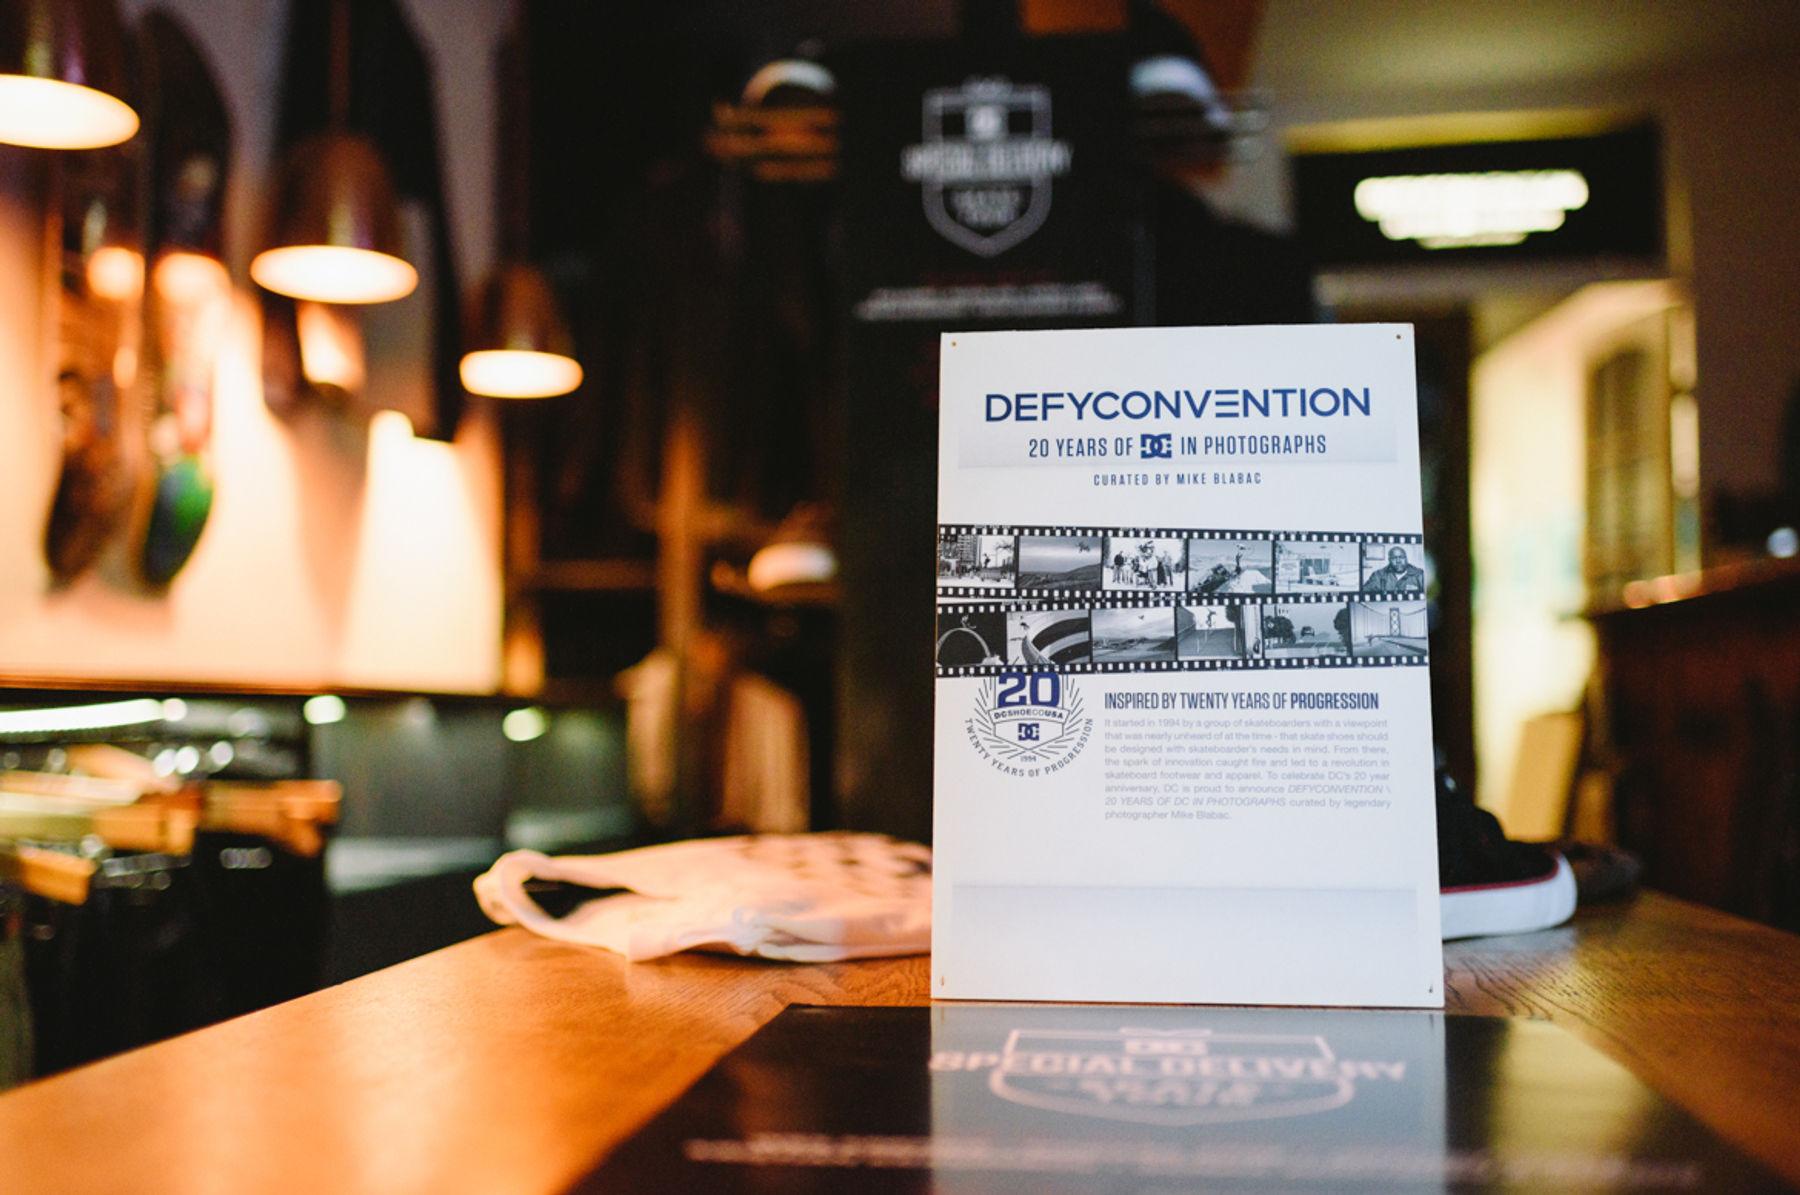 _IHC3793e-DC-Special-Delivery-Skate-Tour-BTS-Parlour-Defy-Convention-Exhibition-London-May-2015-Photographer-Maksim-Kalanep